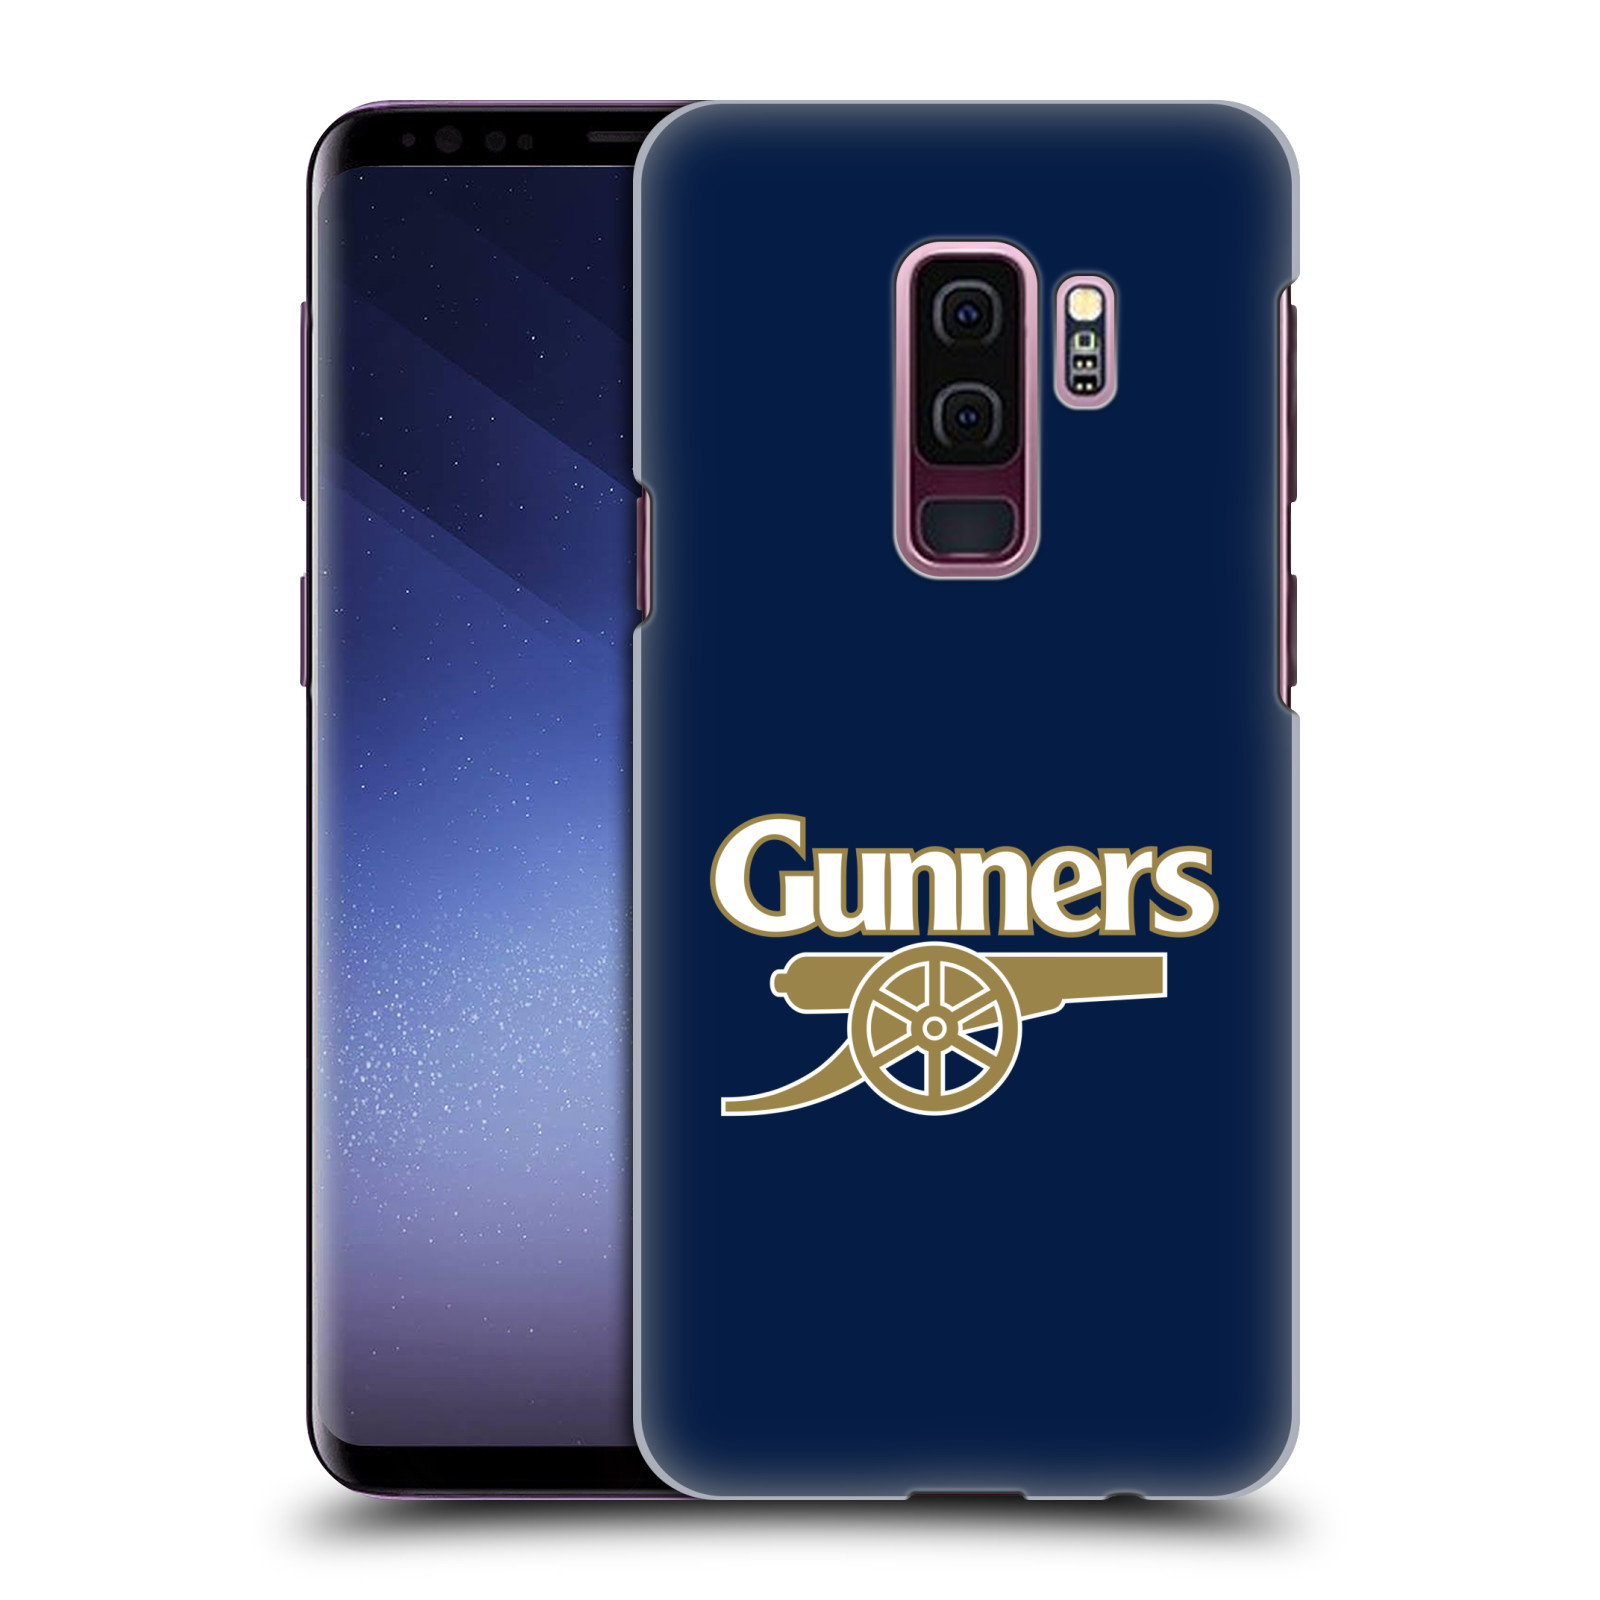 Plastové pouzdro na mobil Samsung Galaxy S9 Plus - Head Case - Arsenal FC - Gunners